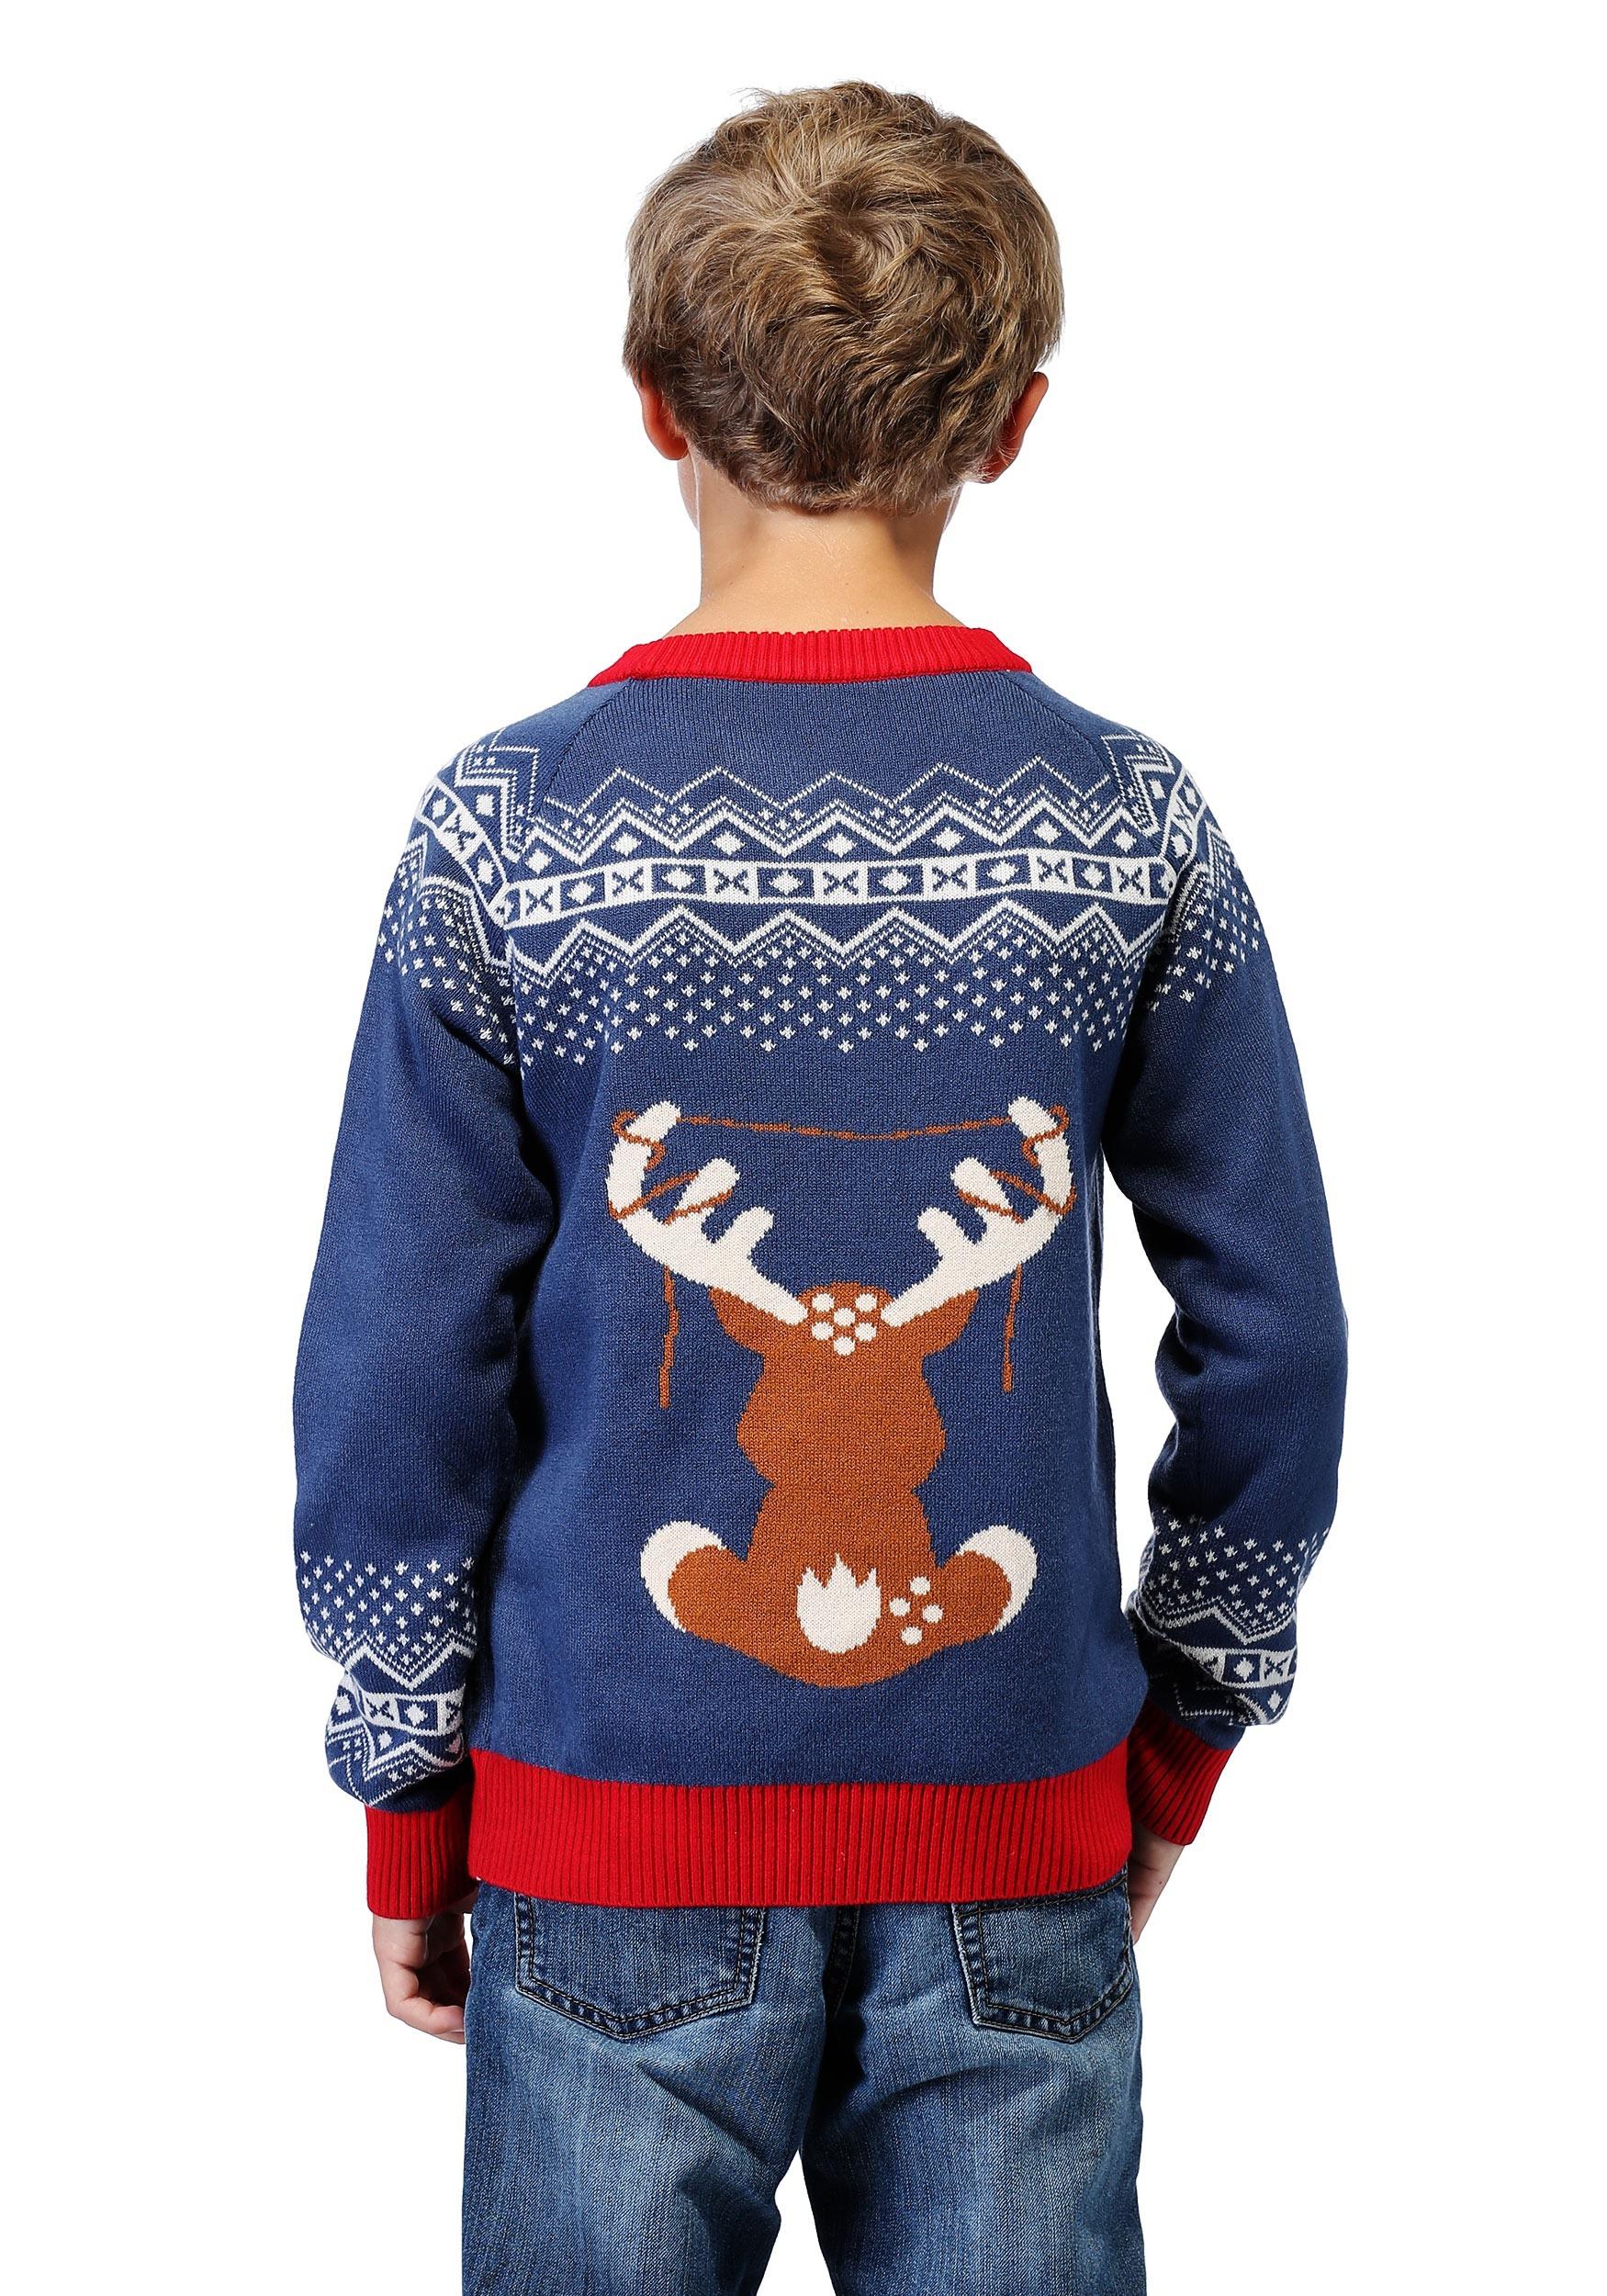 Light Up Christmas Sweater.Boy S Reindeer Led Light Up Ugly Christmas Sweater